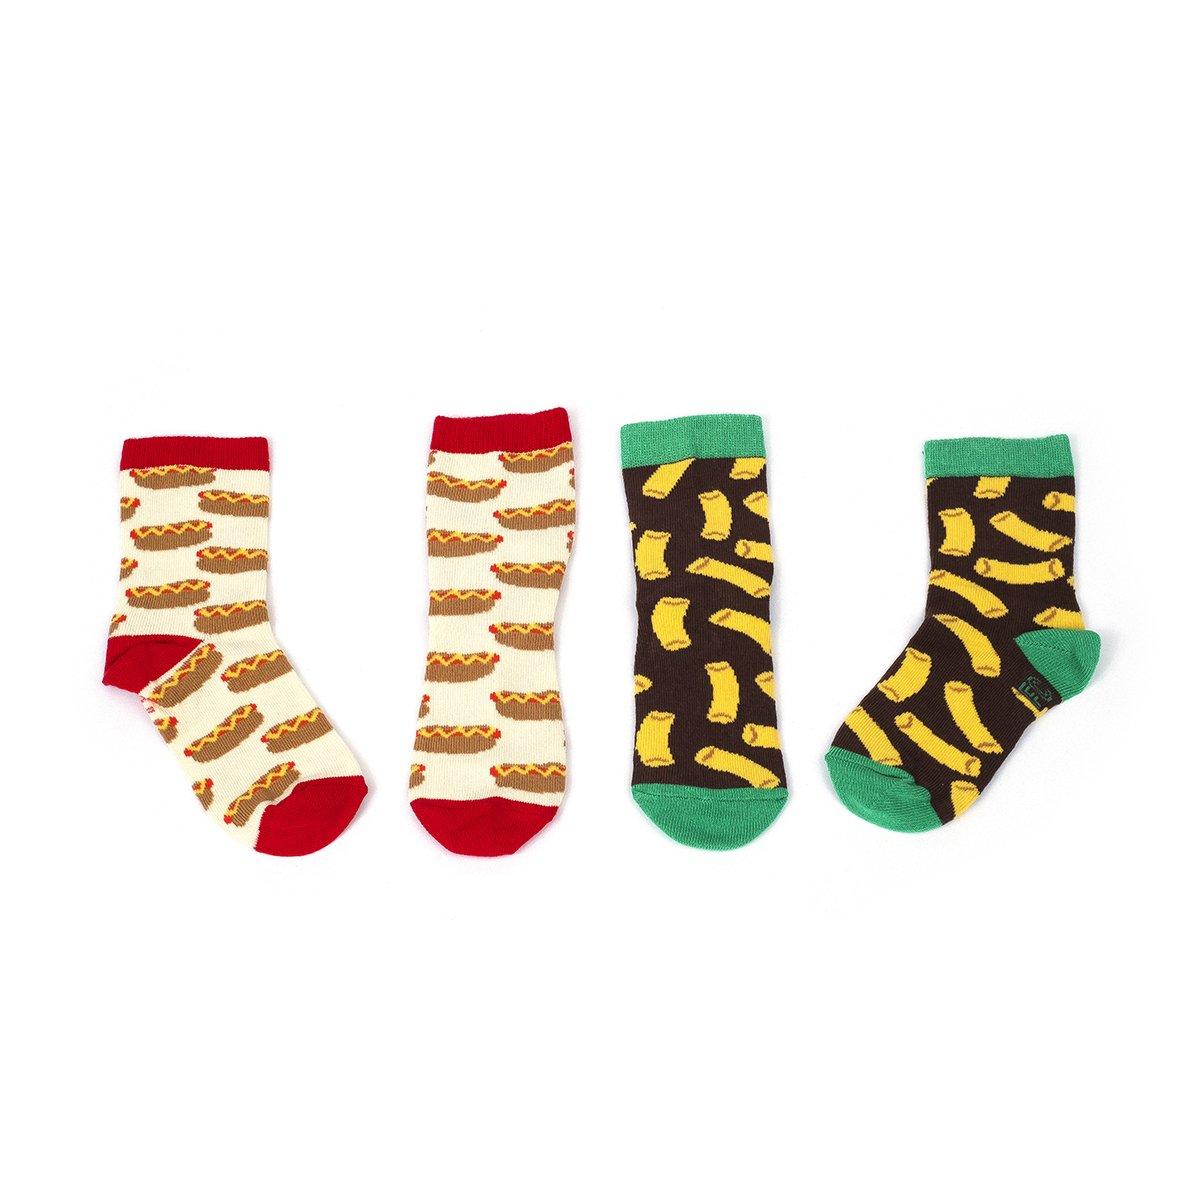 Foot Cardigan Boys' Snack Pack 2 Pack Socks Medium (Big Boys) Red/Yellow